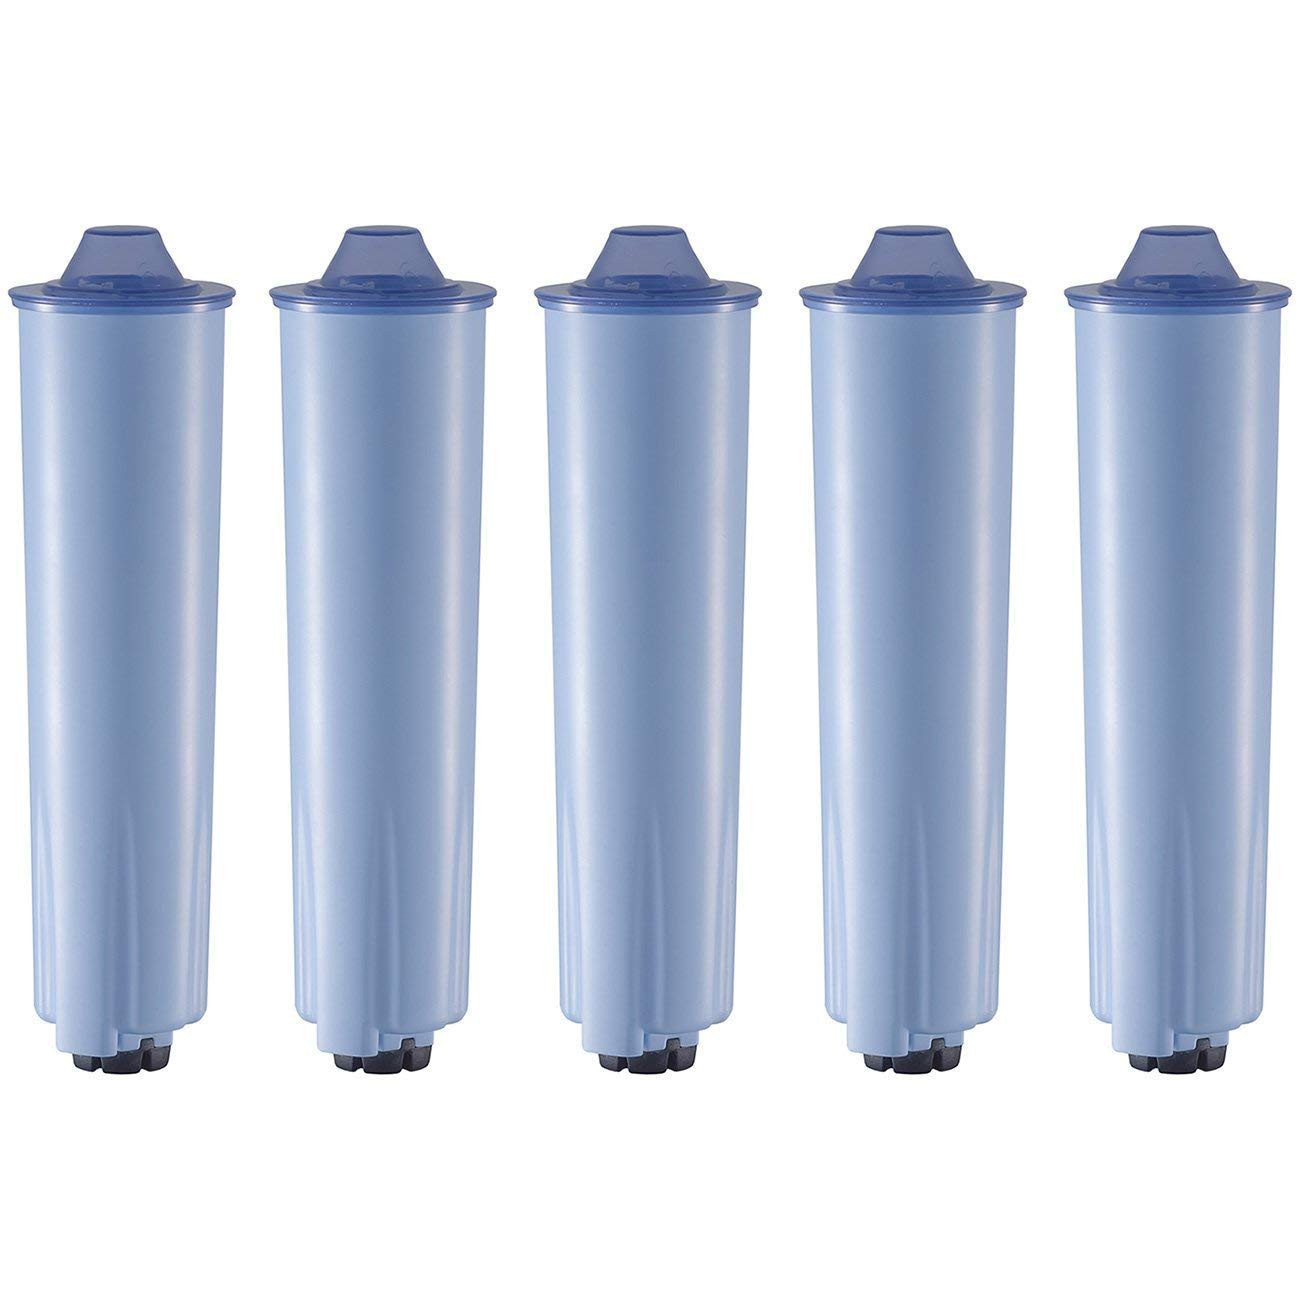 5 -Pack Uniwater Water Filter Cartridges for Jura ENA/Claris blue coffee machines